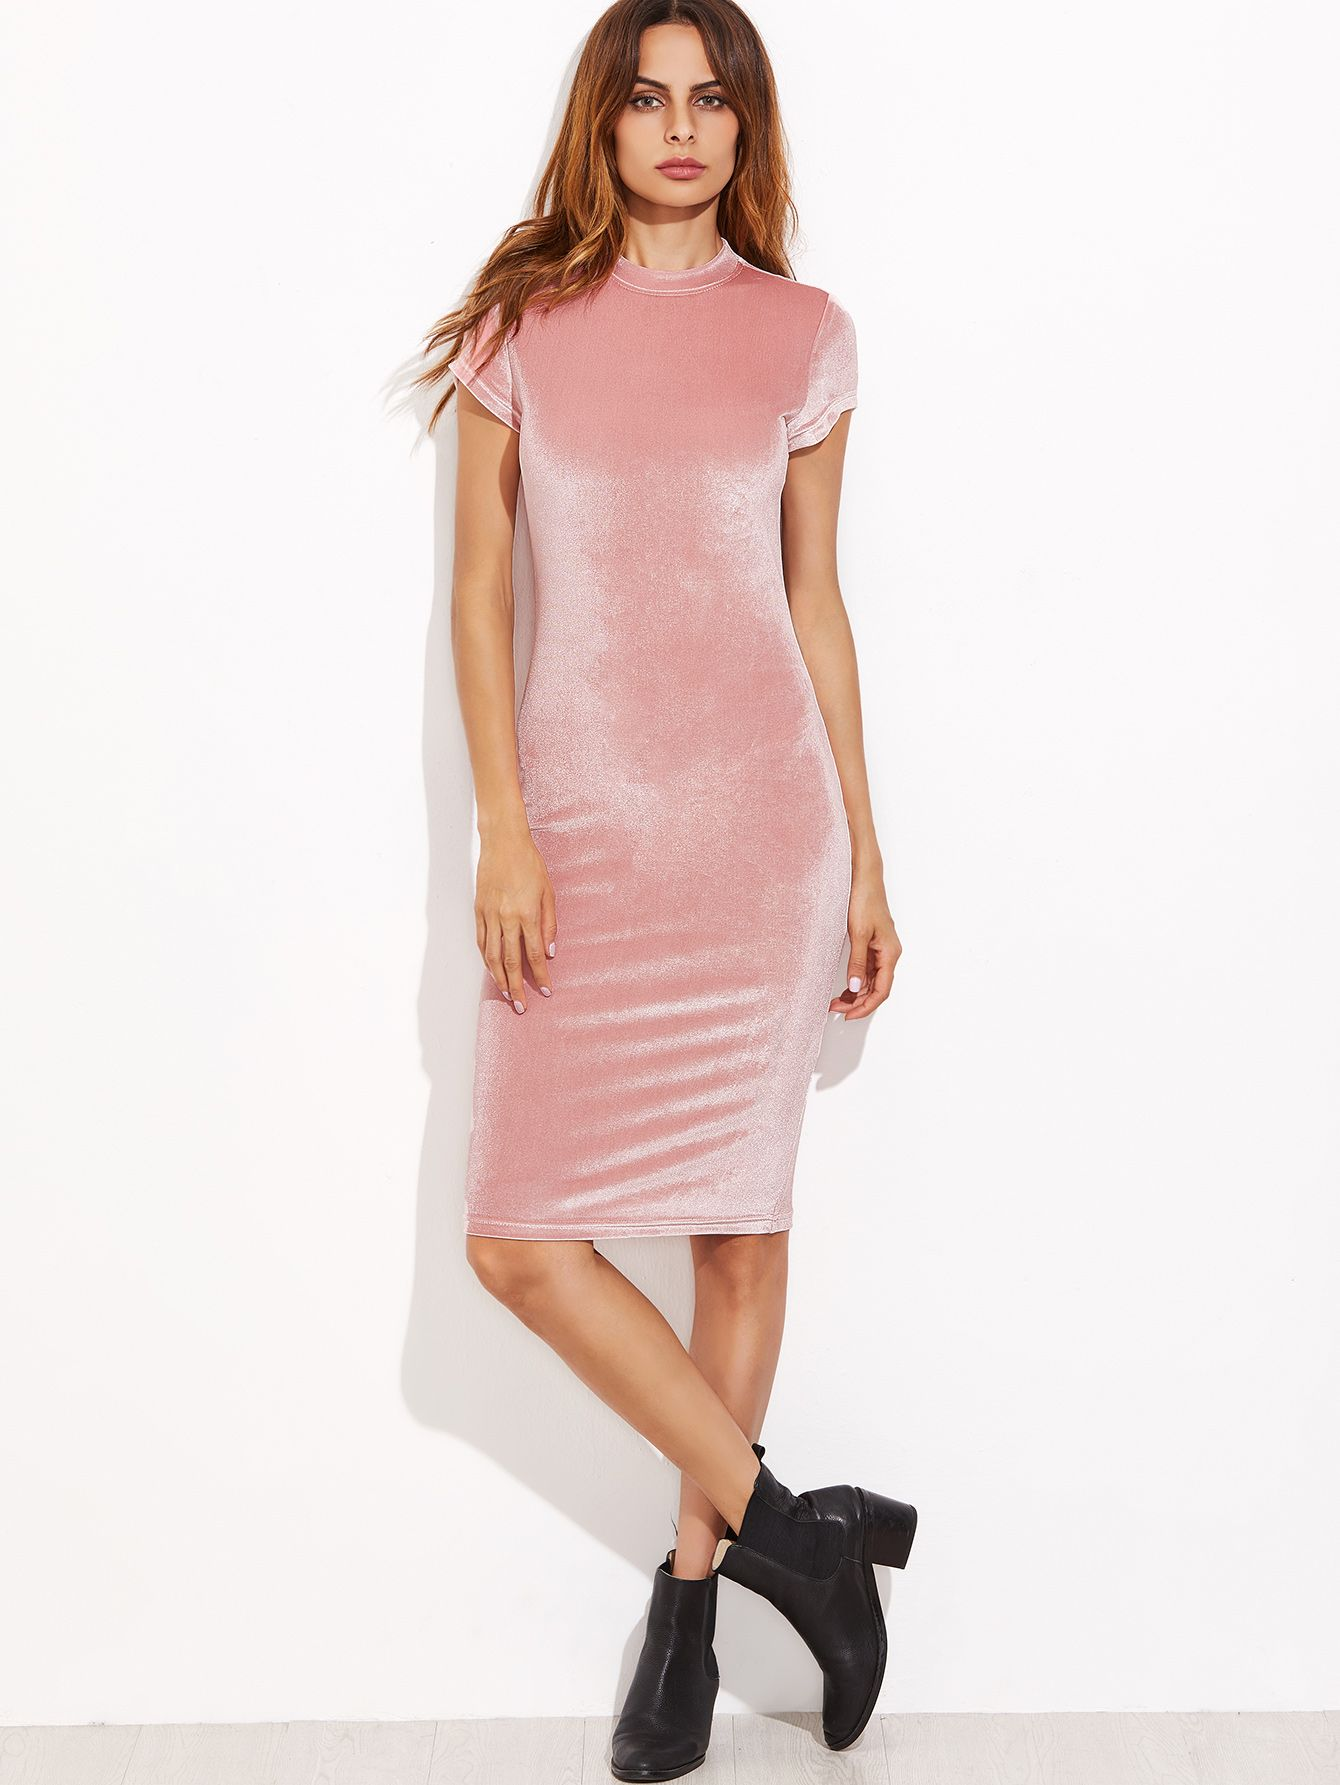 Vestido de tubo de terciopelo con cuello alto, rosa (Sheinside. 10 ...